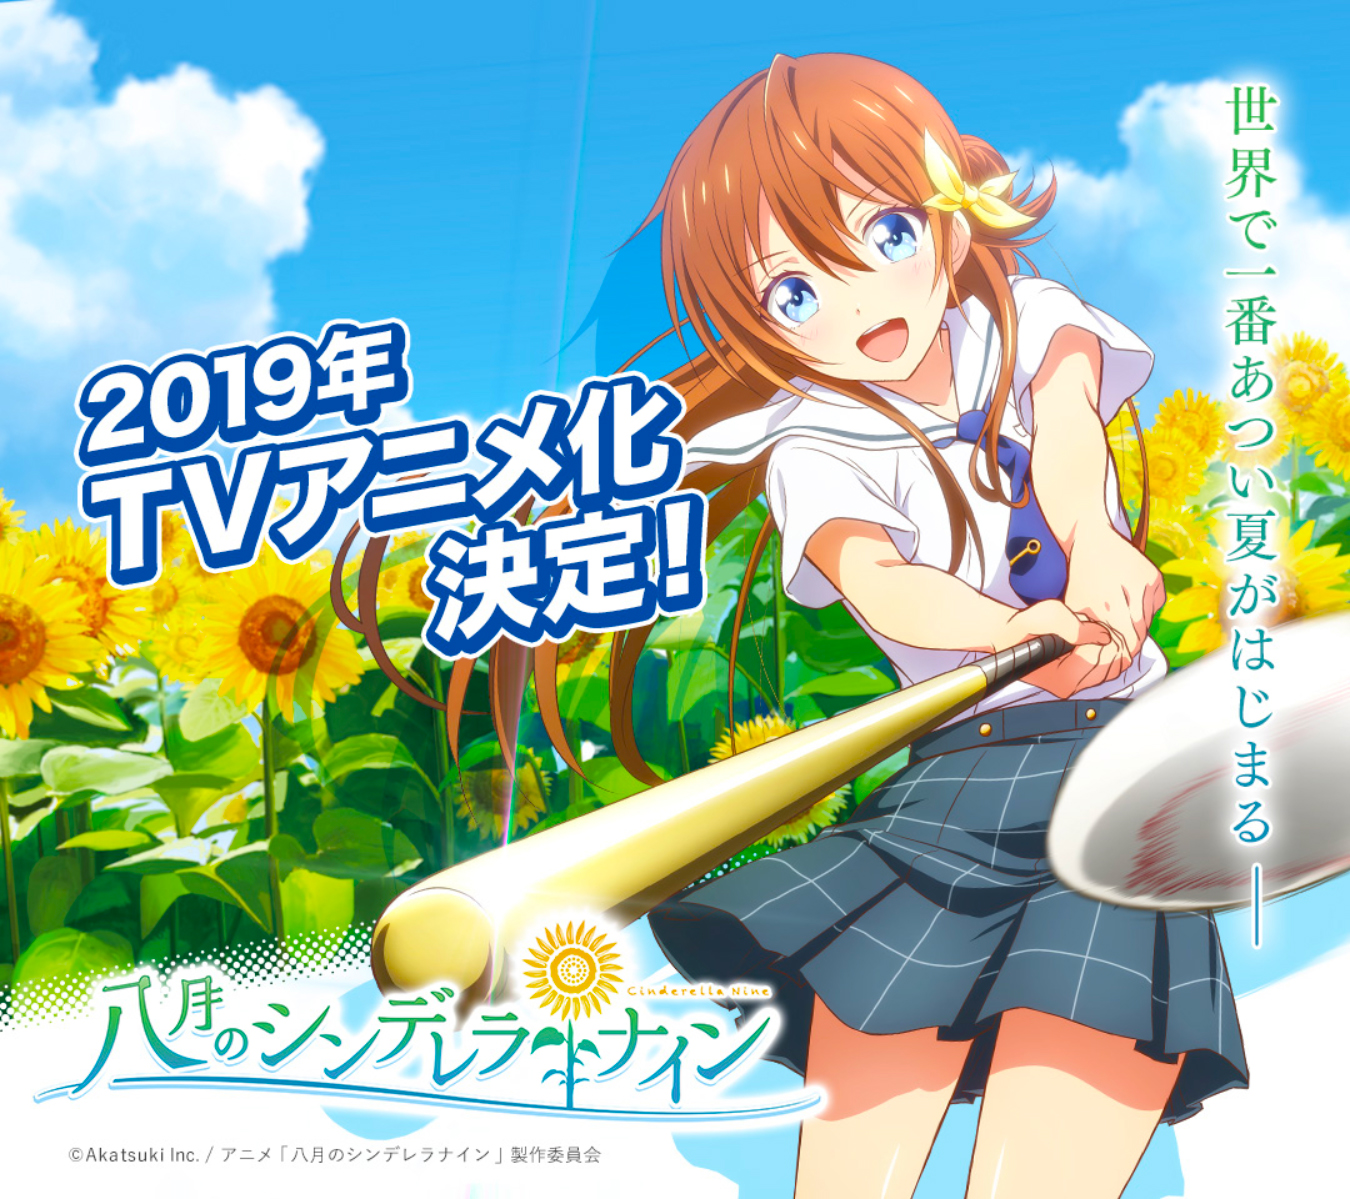 181110 - 育成美少女打棒球甲子園、手機遊戲改編2019年電視動畫版《八月のシンデレラナイン》主角5人造型公開!